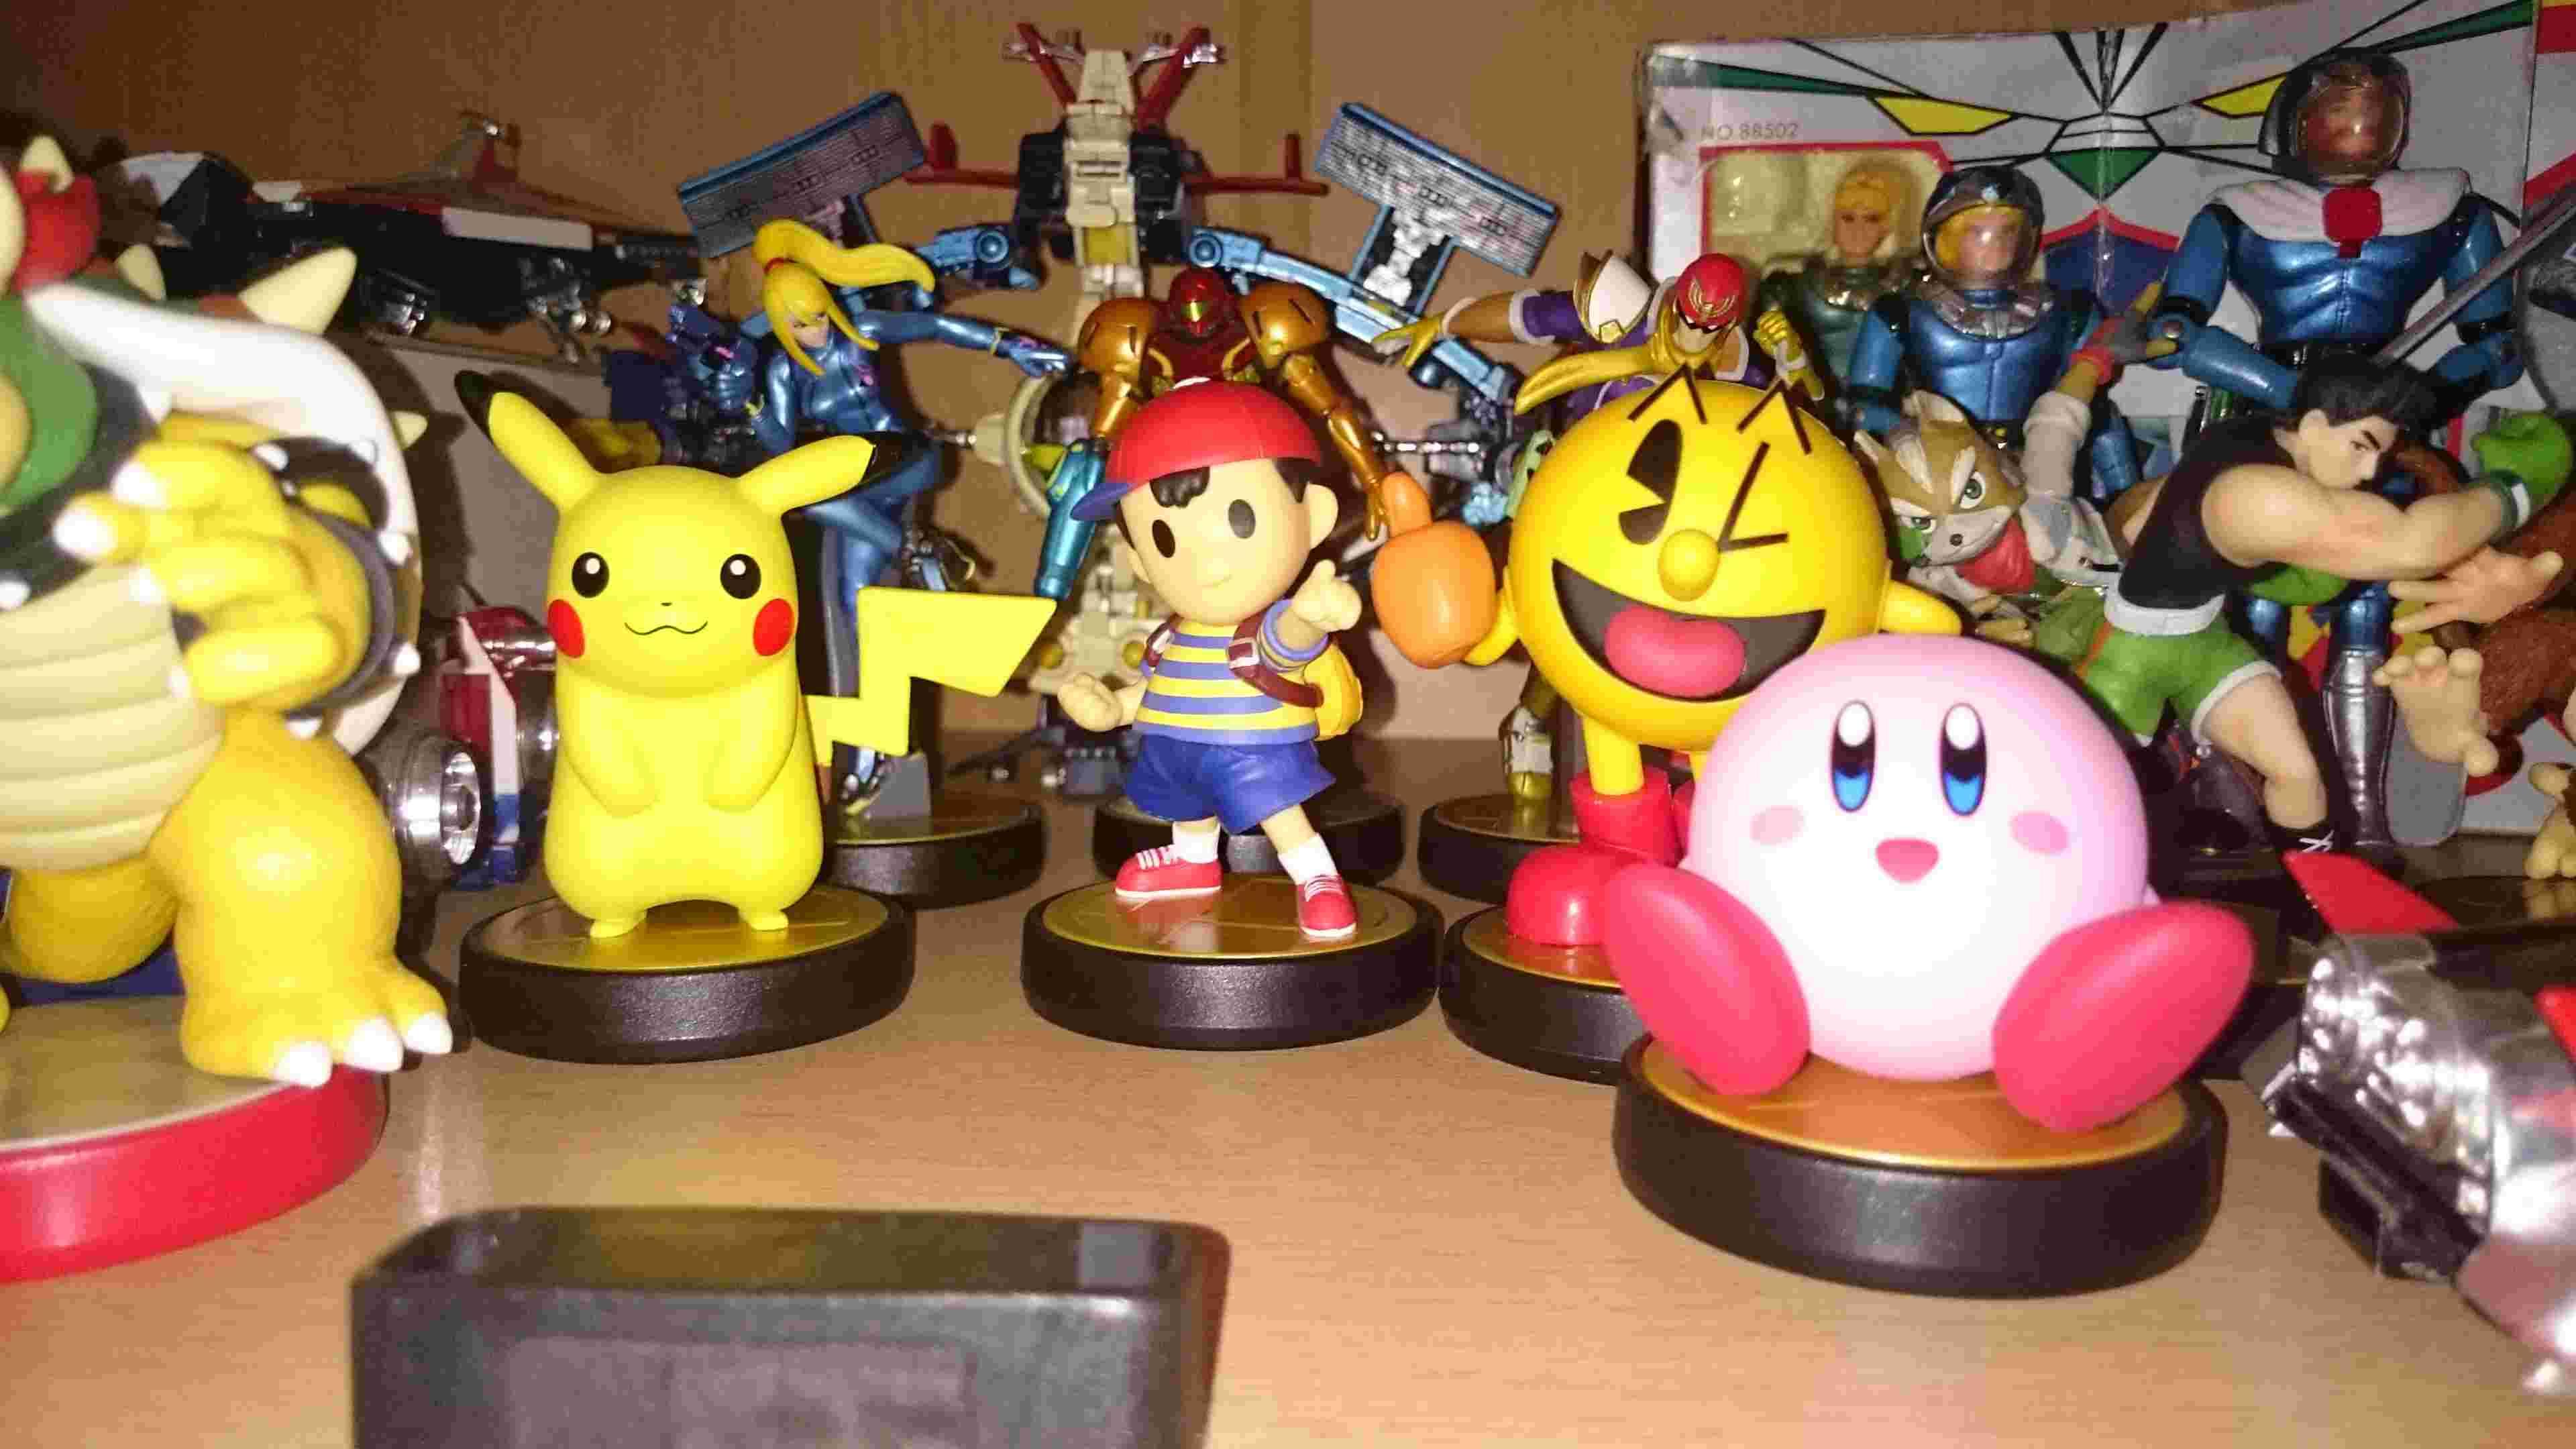 Postez vos photos figurines Nintendo WiiU Amiibo ! Amiibo11